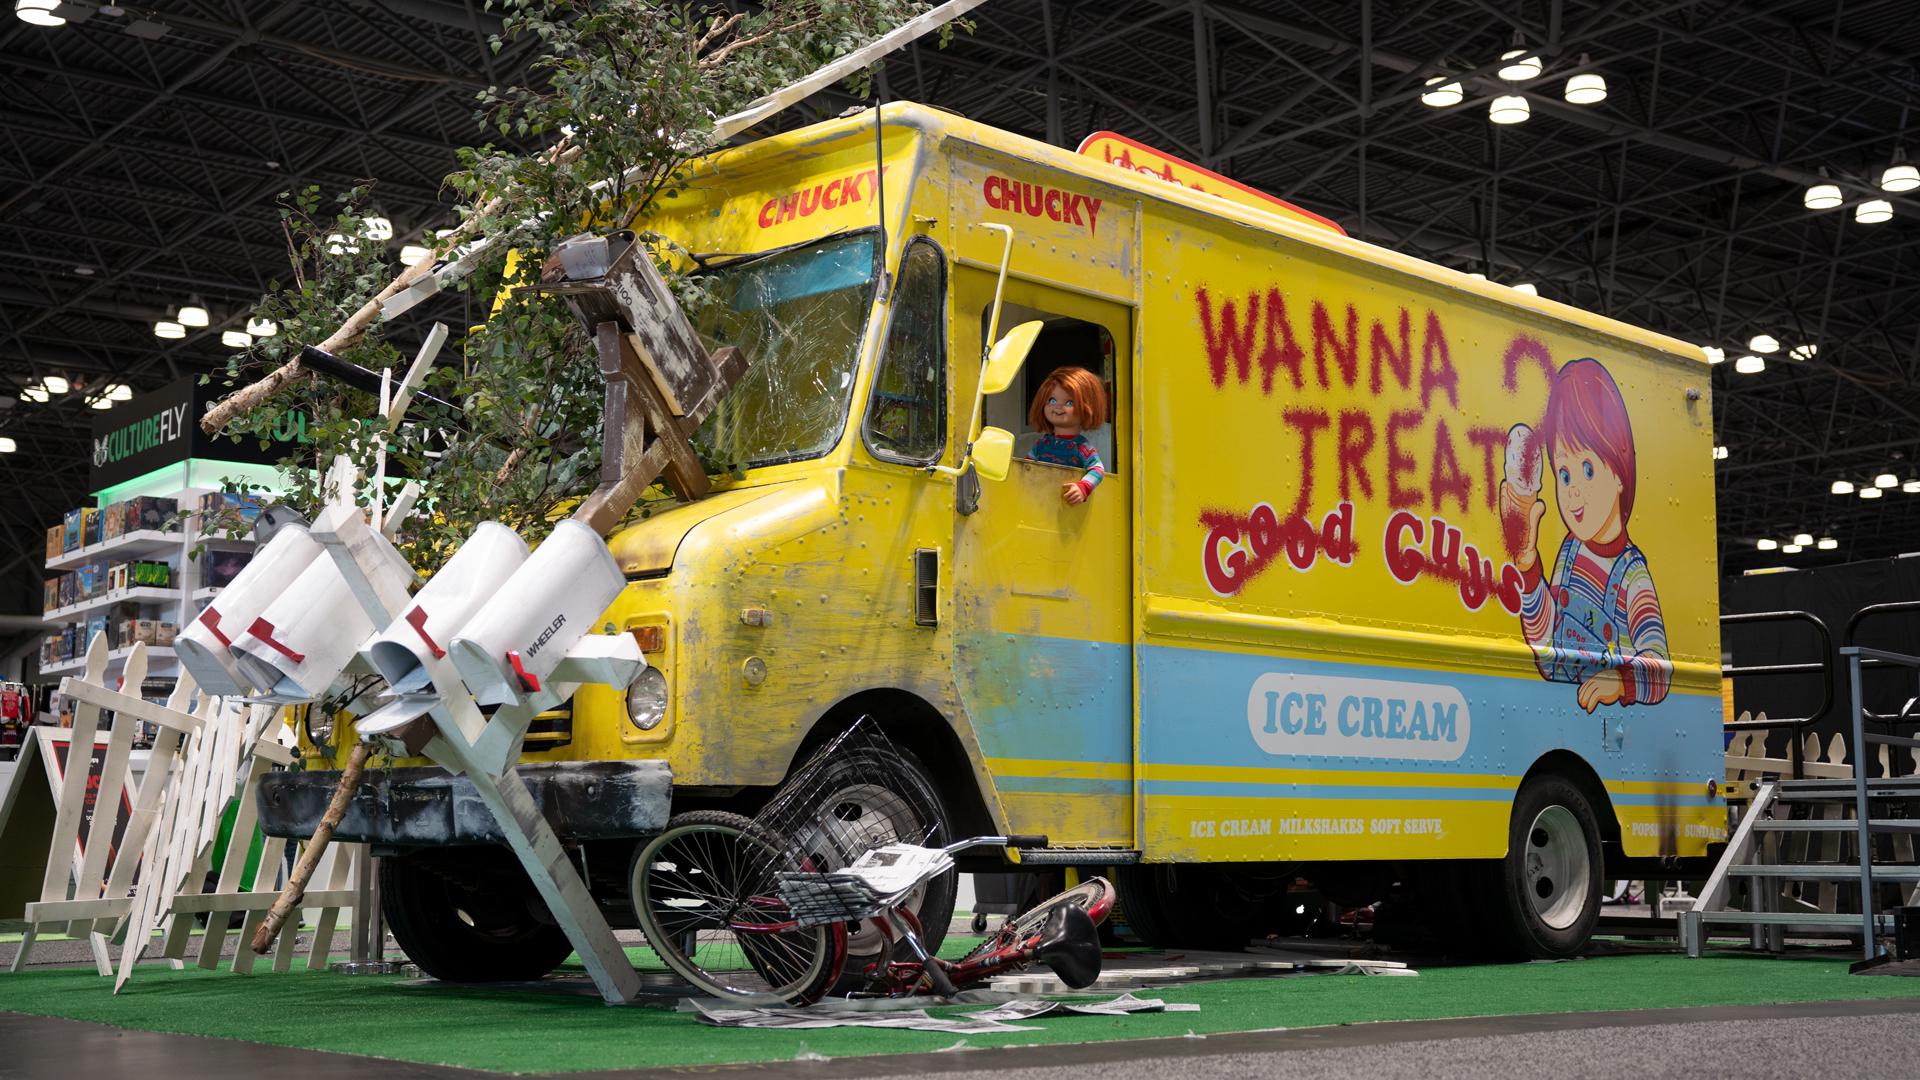 USA/SYFY's Chucky and The Many Crashed New York Comic Con